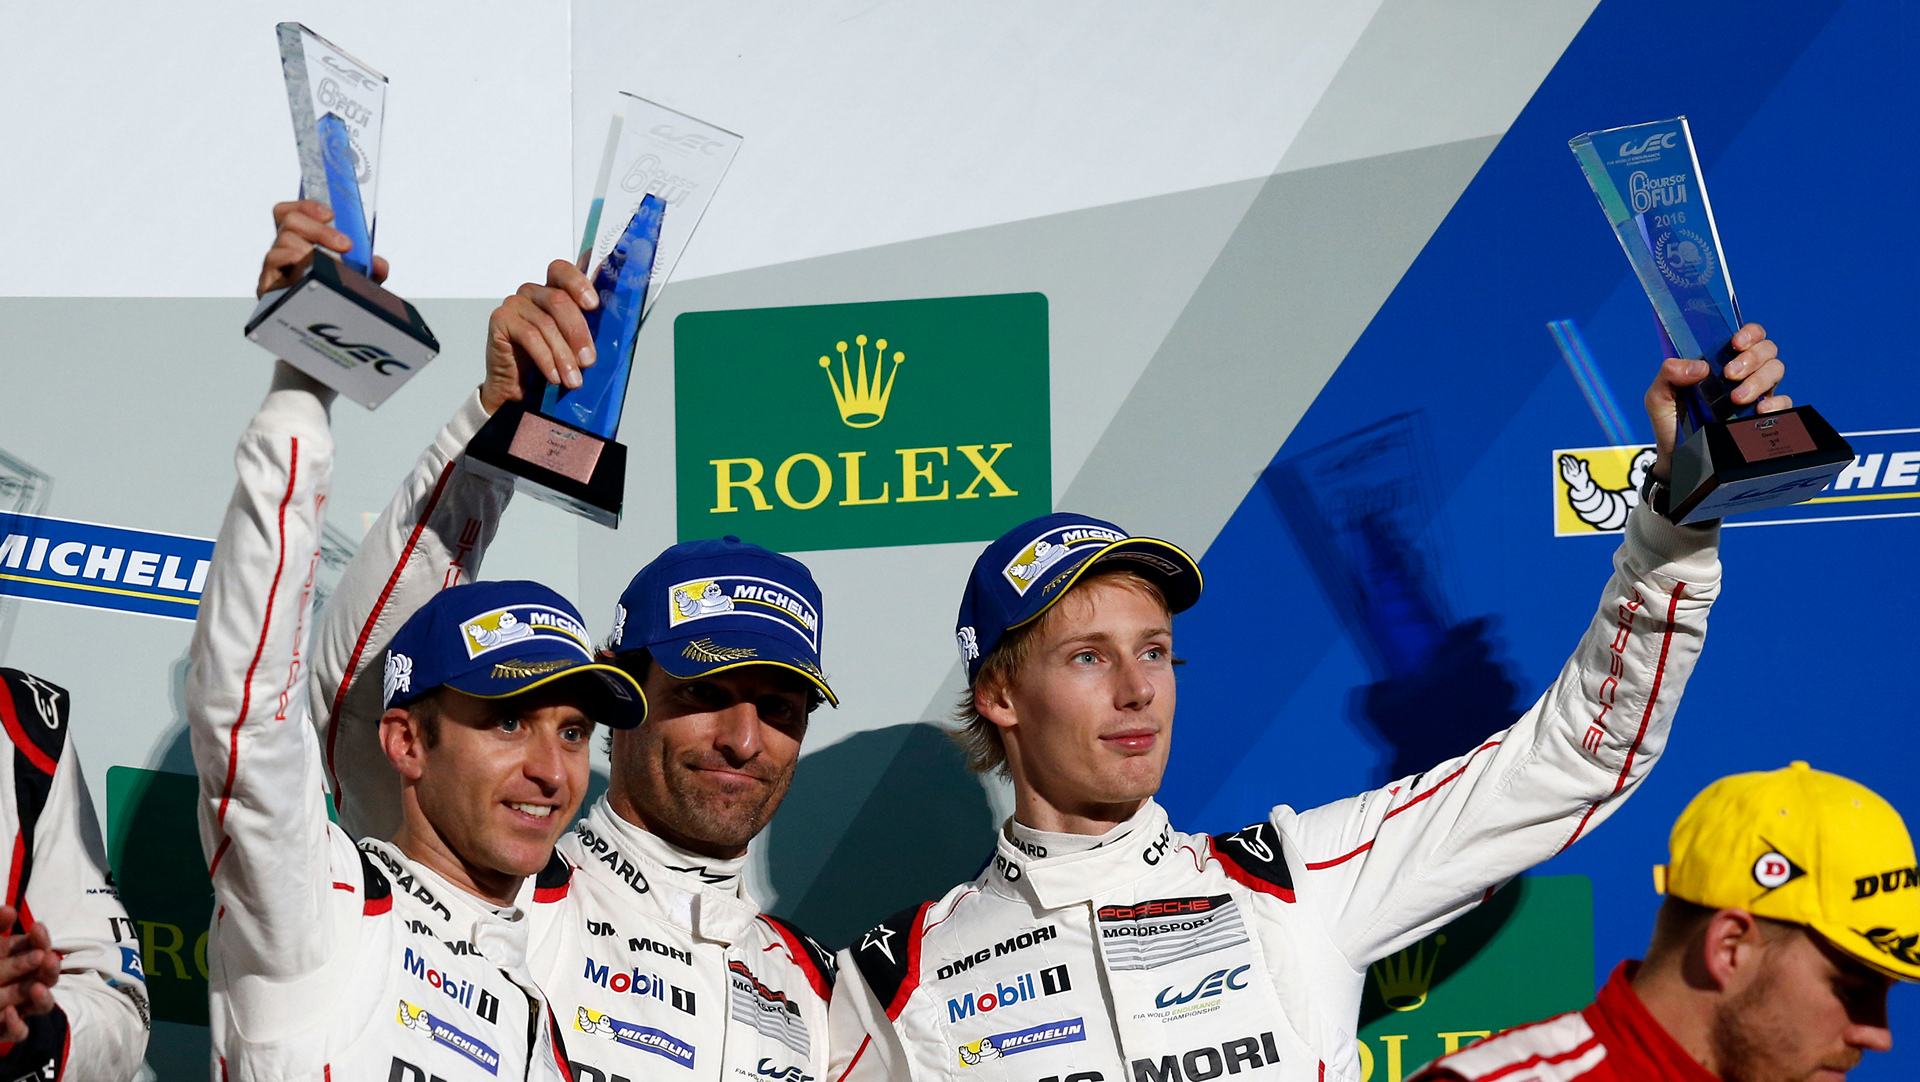 Porsche works driver, l-r: Timo Bernhard, Mark Webber, Brendon Hartley, WEC, Fuji © Dr. Ing. h.c. F. Porsche AG